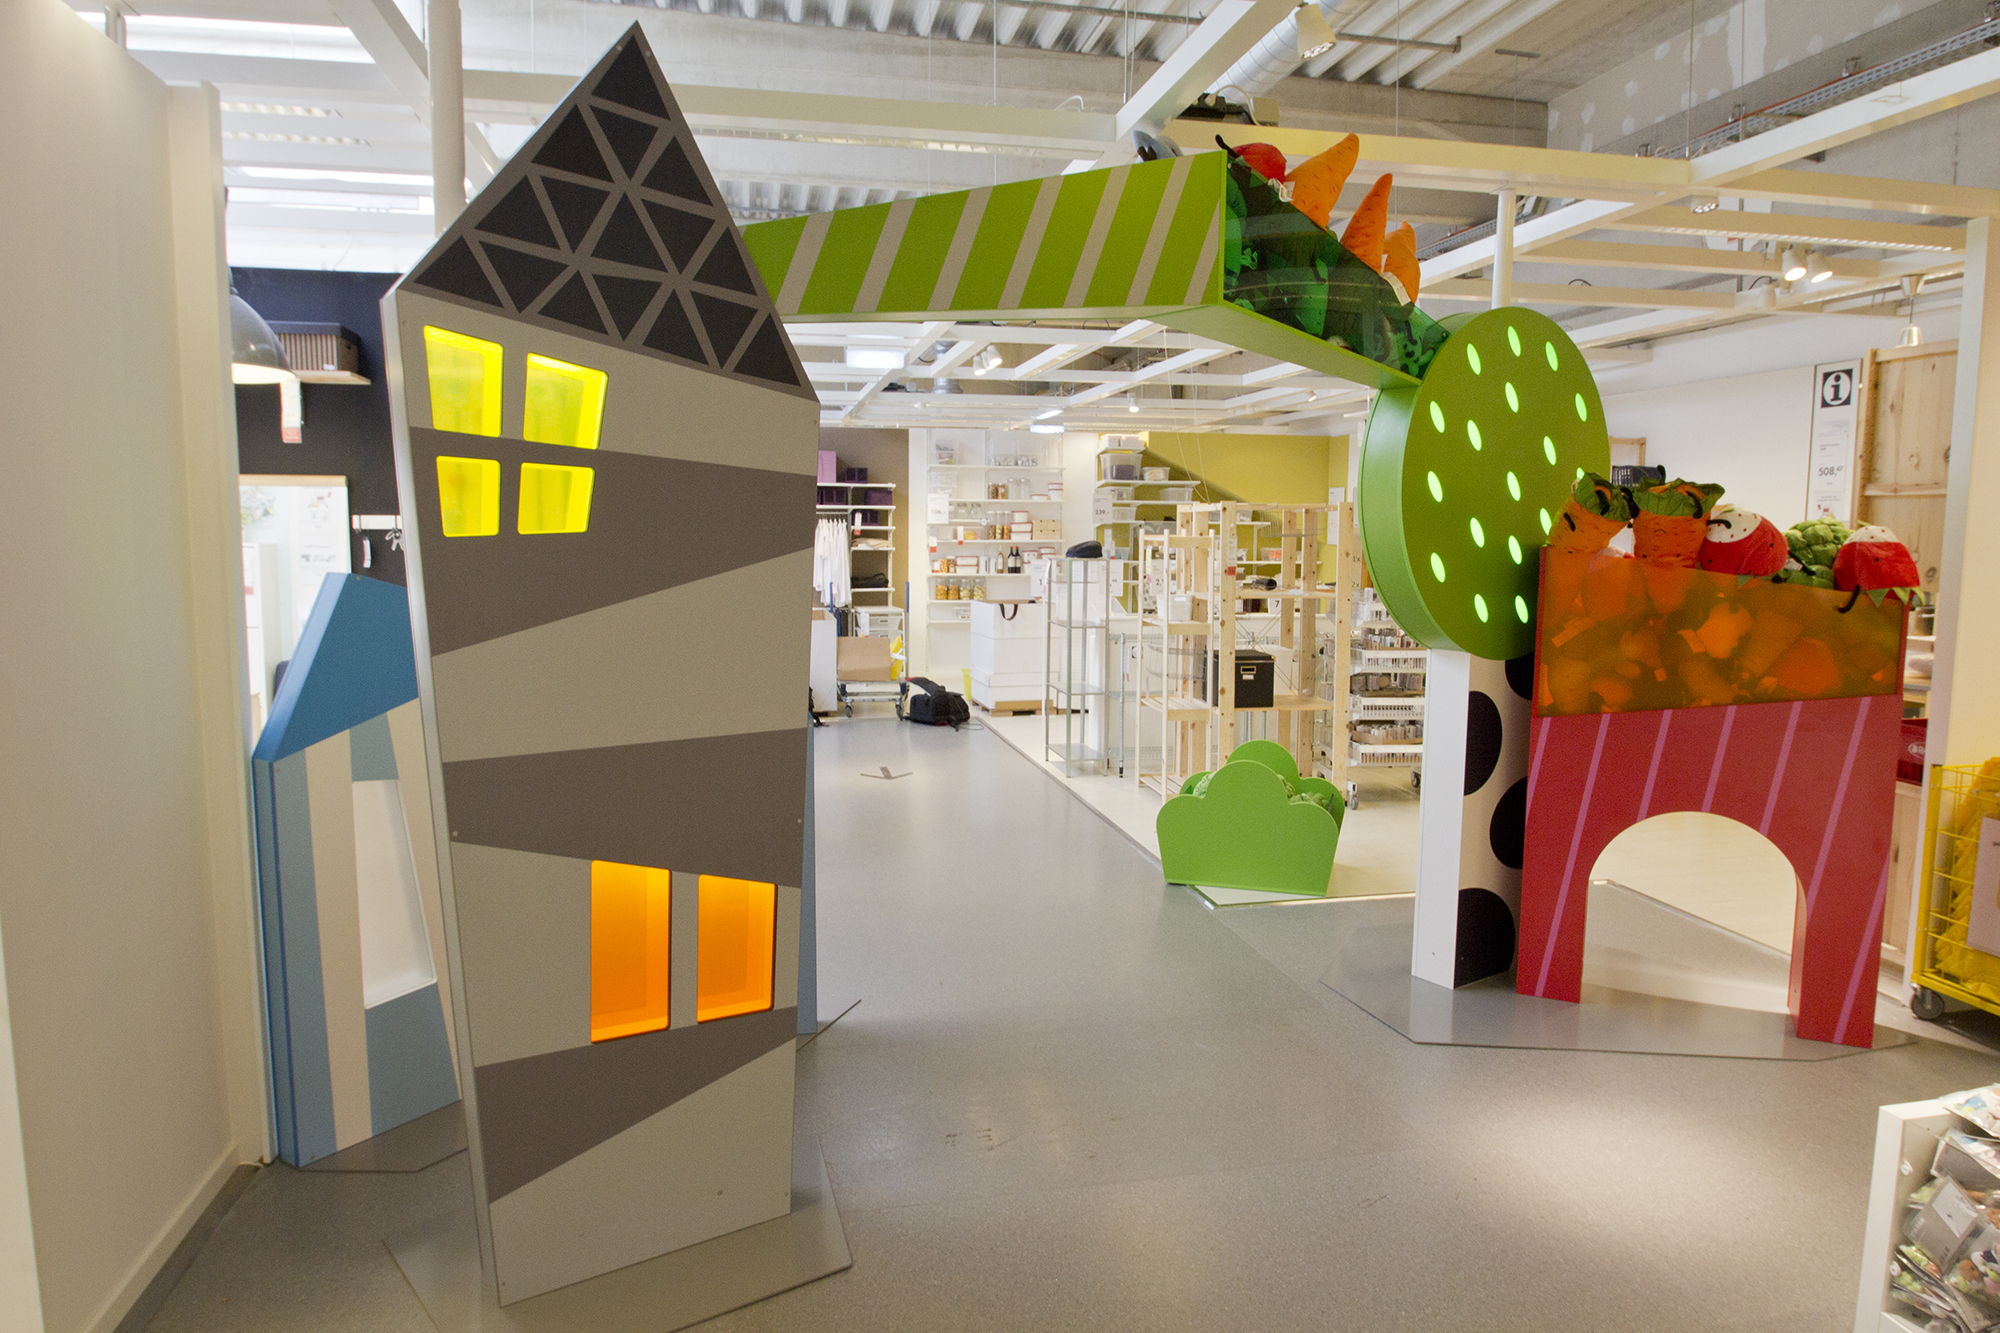 Childrens_IKEA_entrance_3.jpg